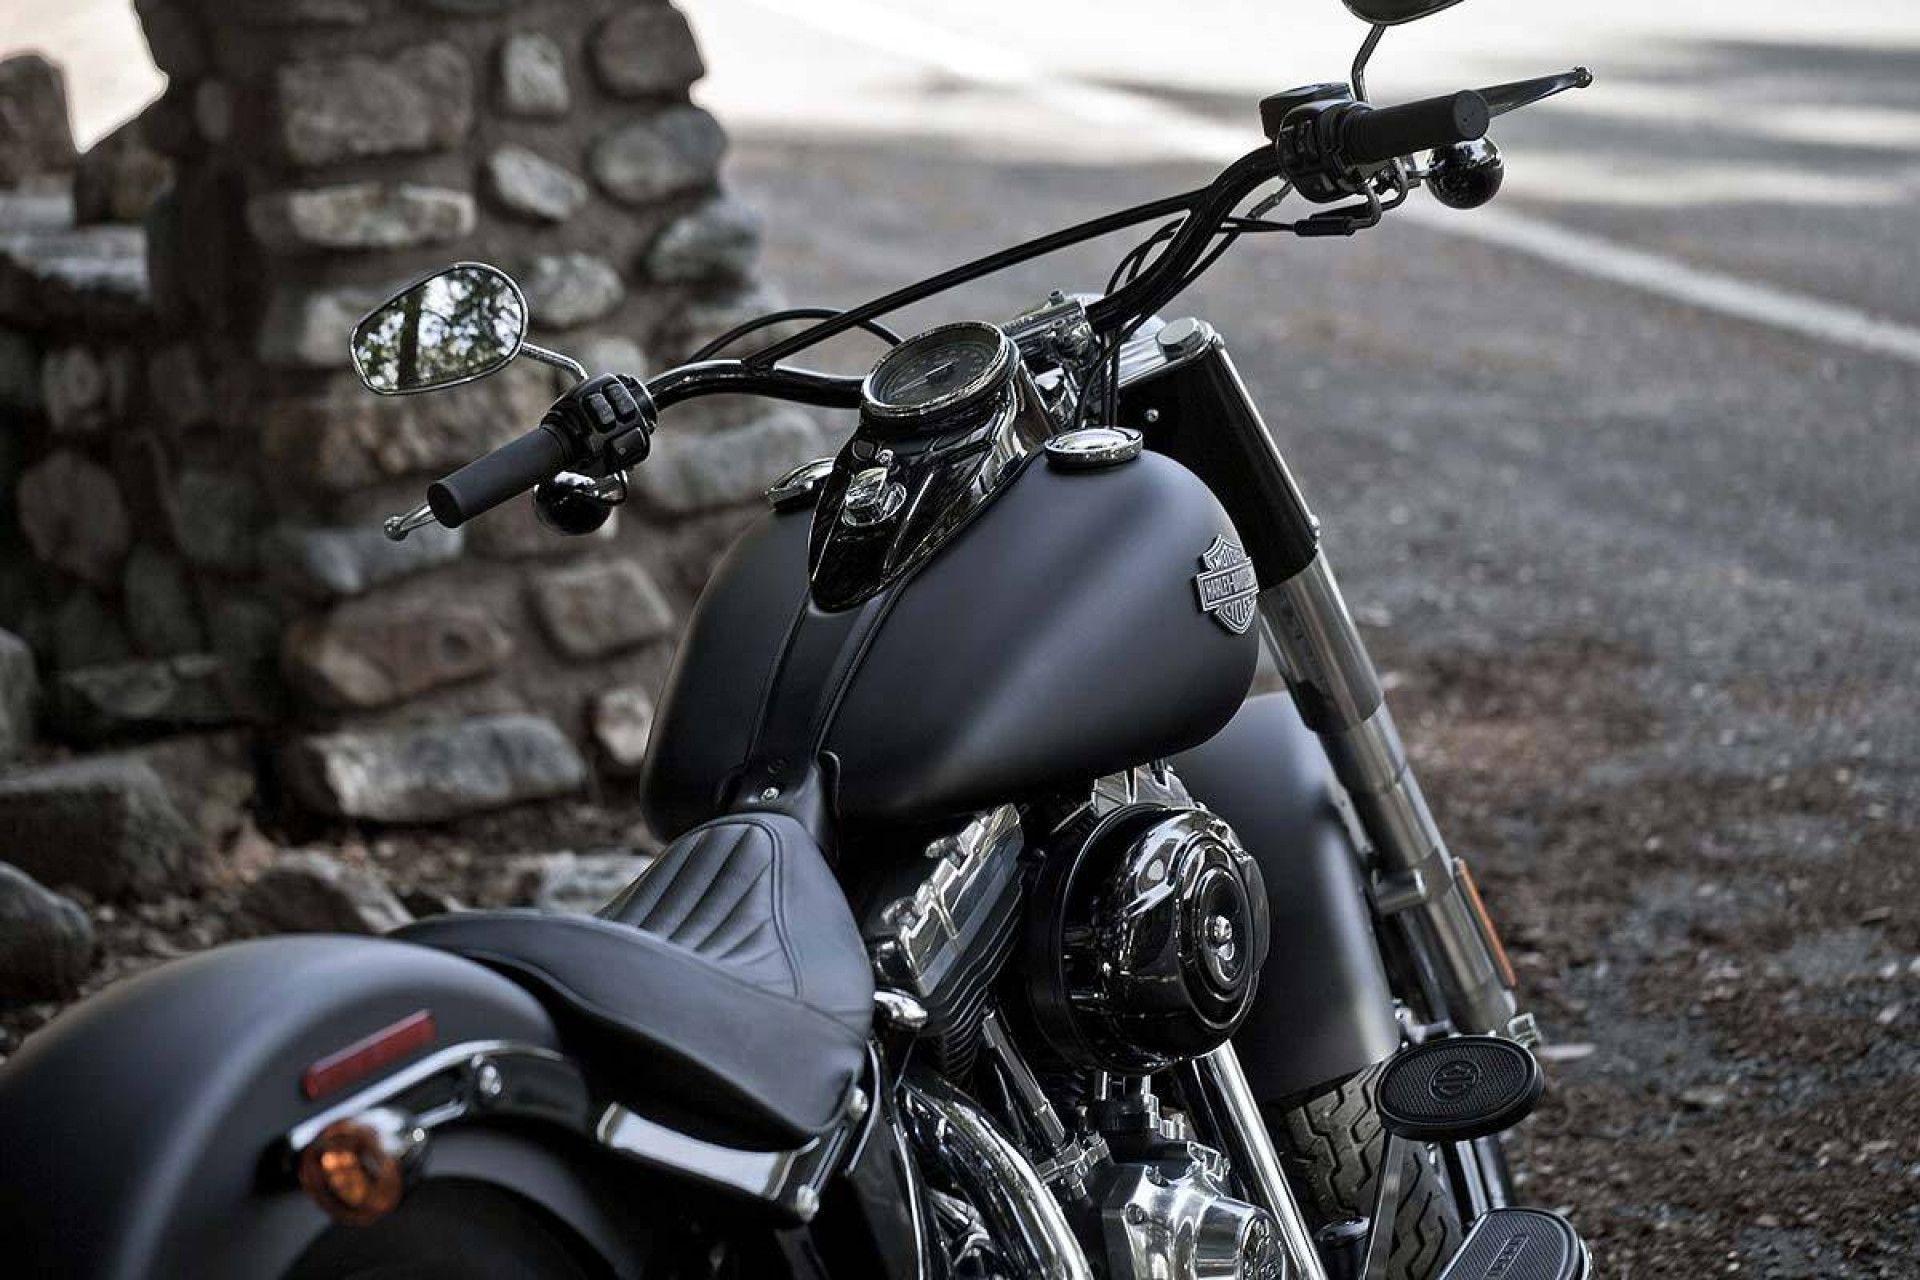 Harley davidson hd wallpapers - Harley davidson wallpaper - HD ...